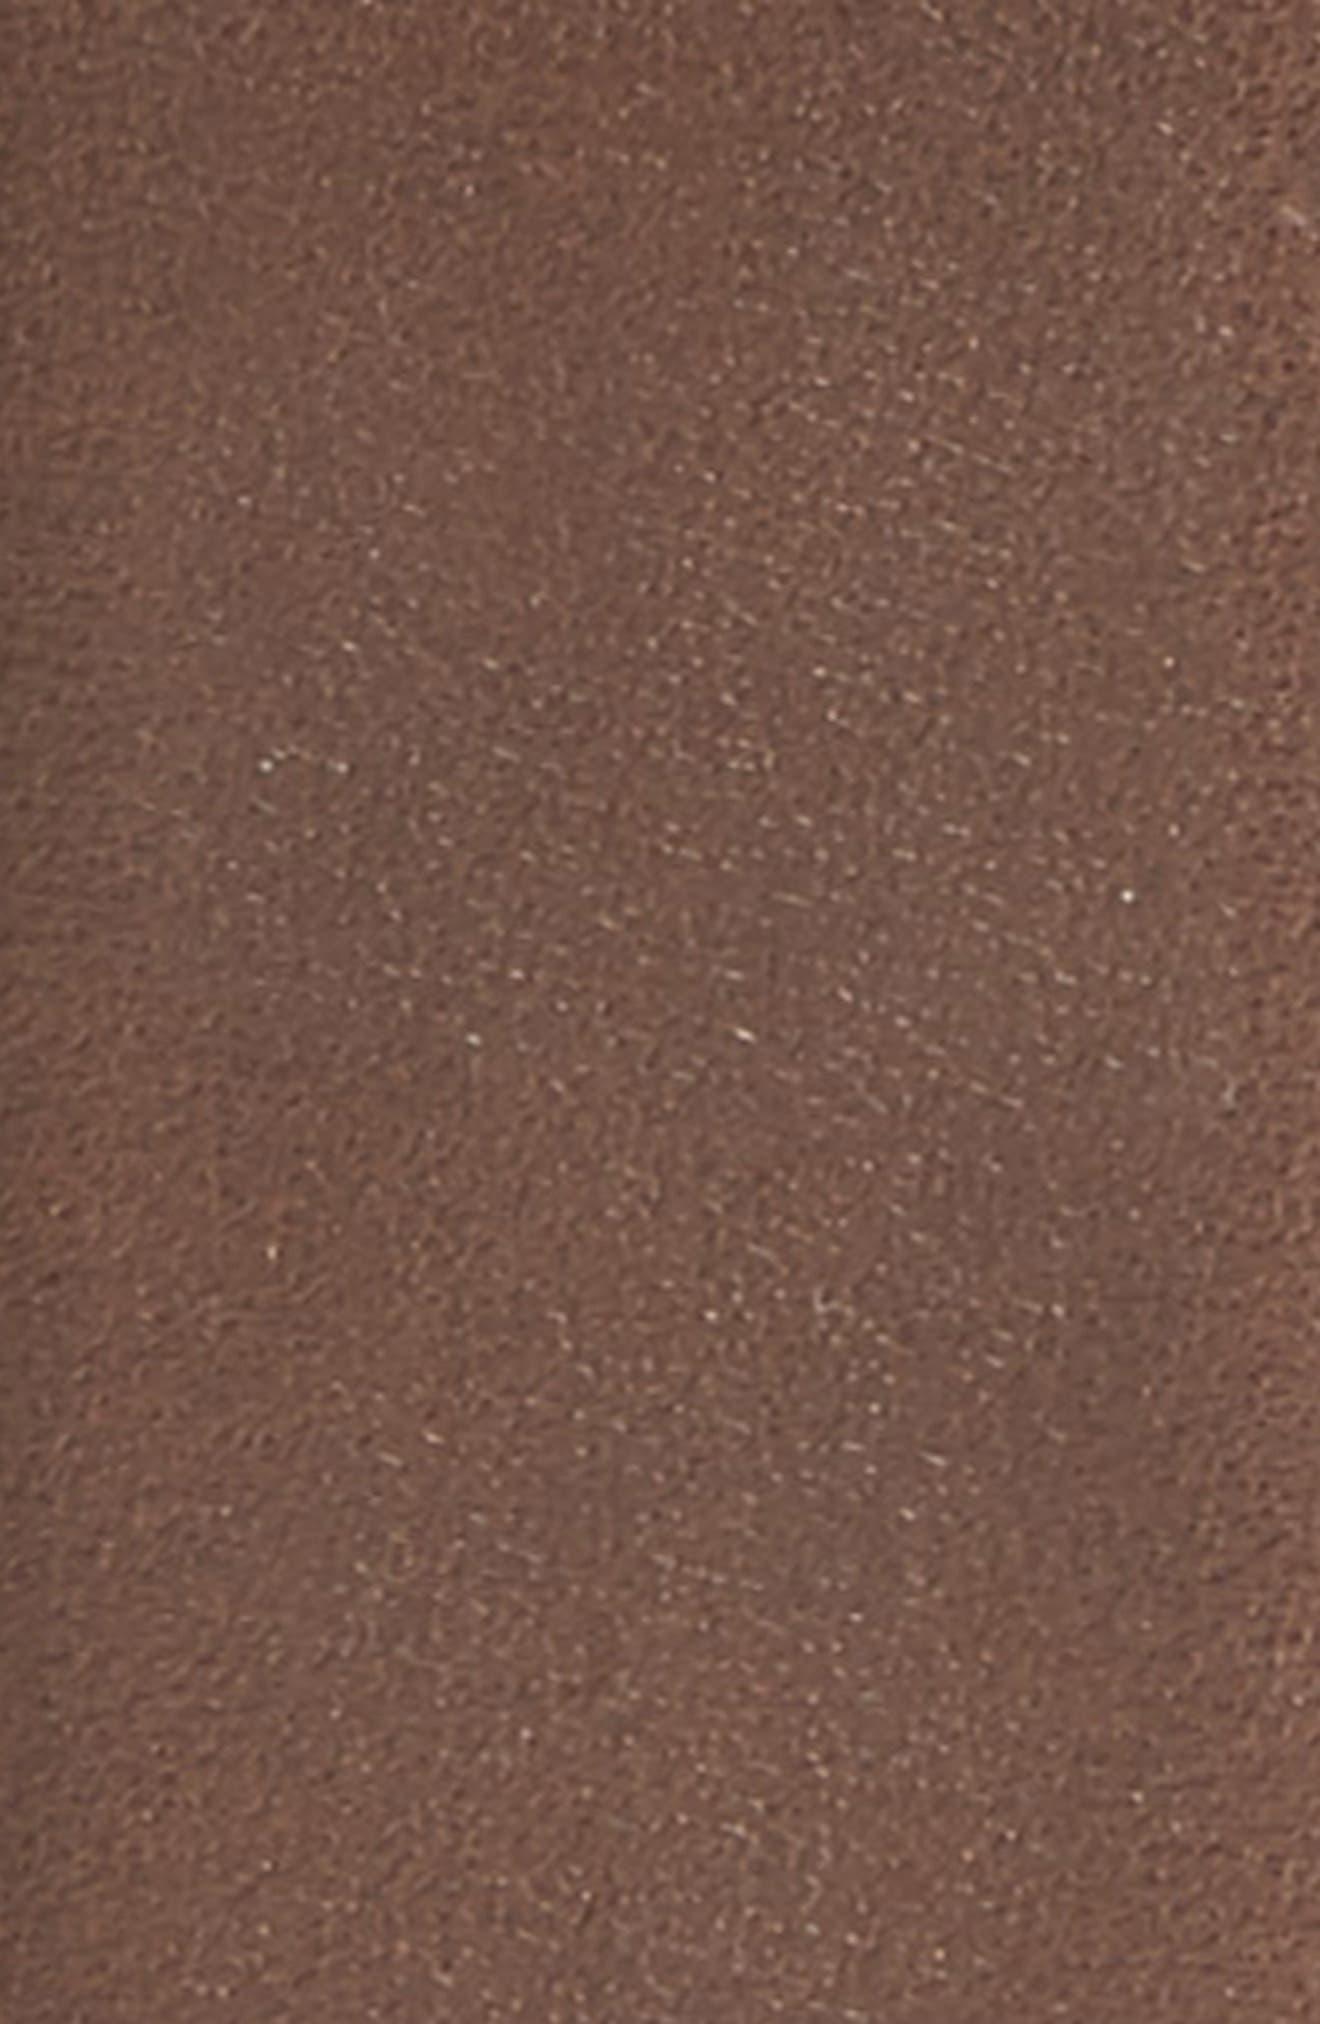 Reversible Leather Belt,                             Alternate thumbnail 3, color,                             BLACK/ BROWN